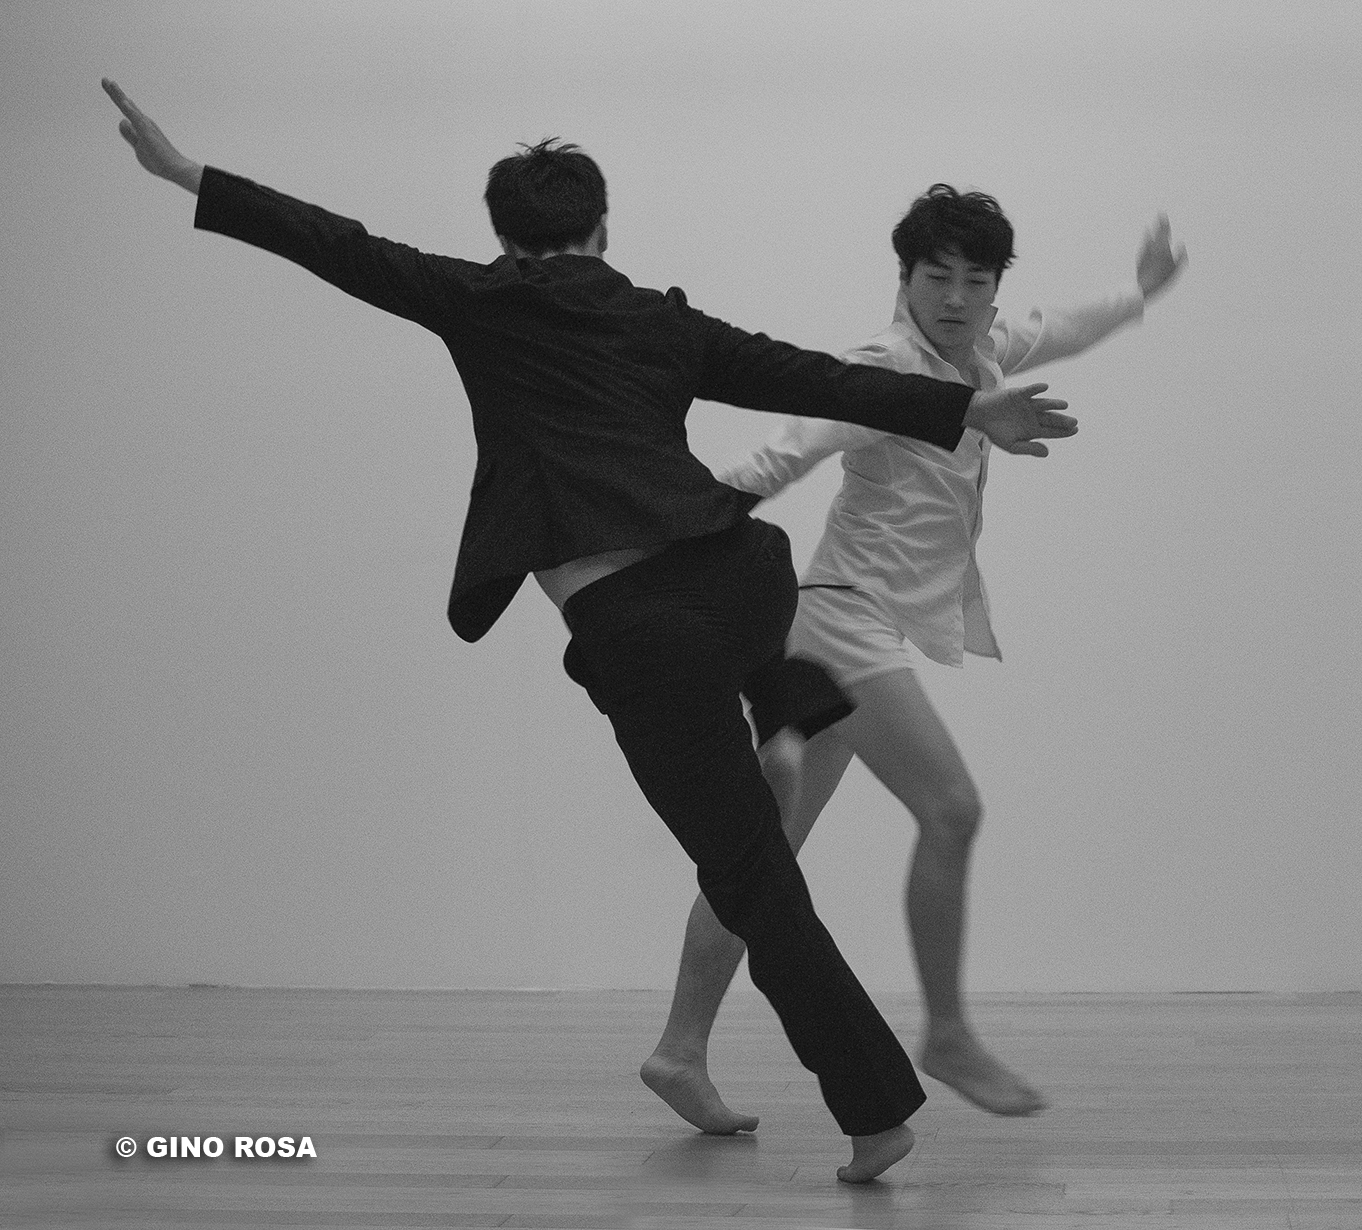 http://www.danzaurbana.eu/associazione/wp-content/uploads/2018/05/Masdanza_Hyunjin_2014.jpg